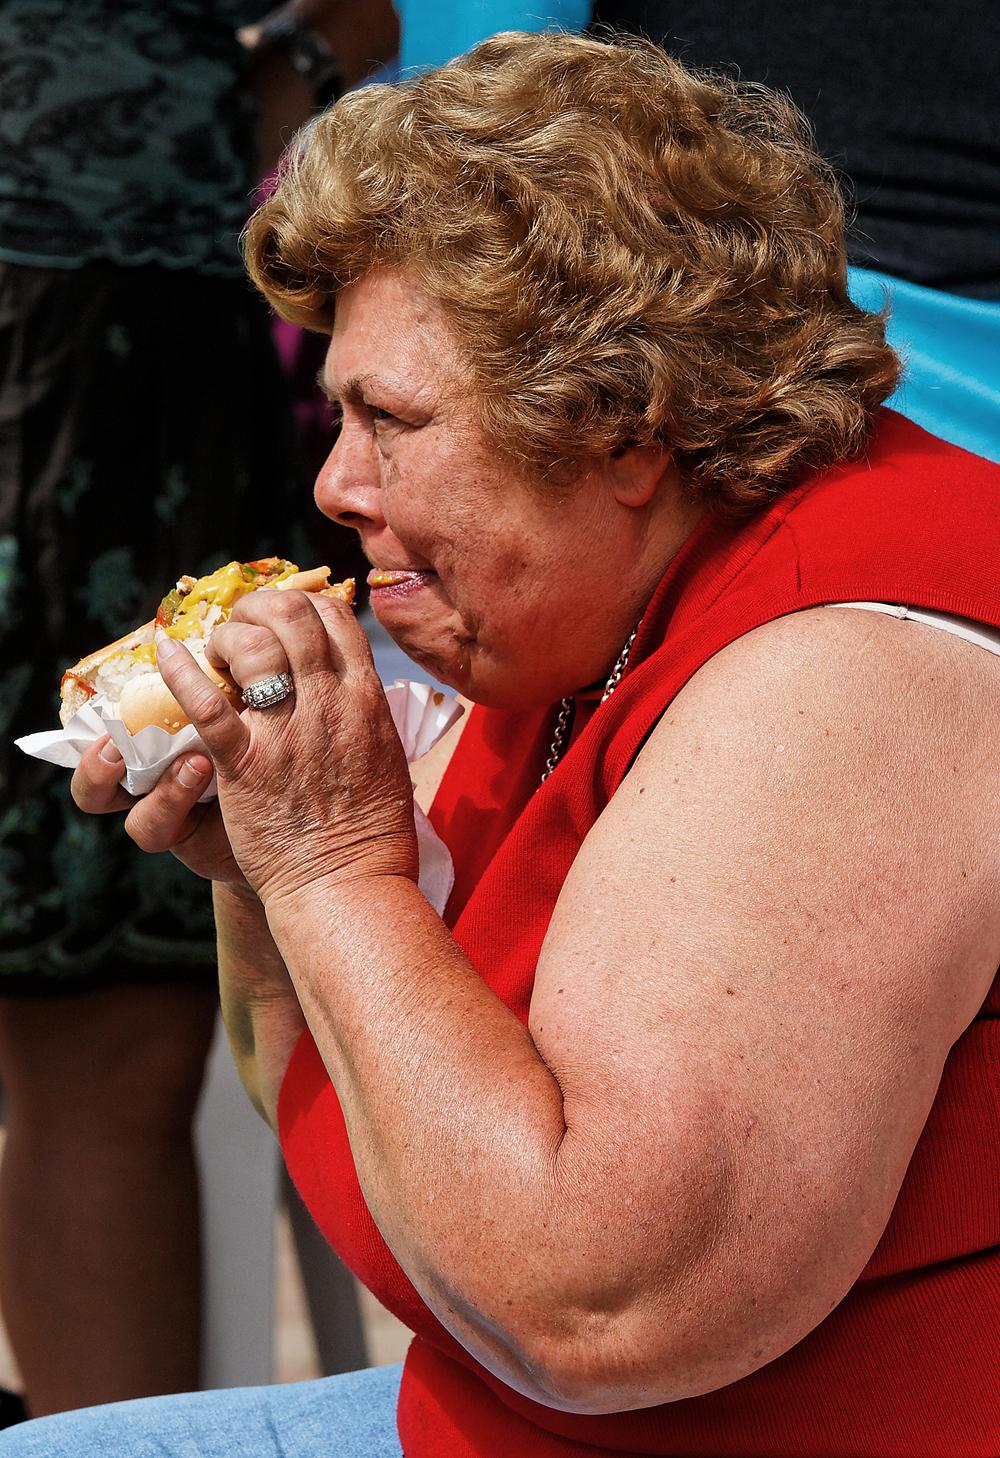 Hotdog, Victoria B.C.